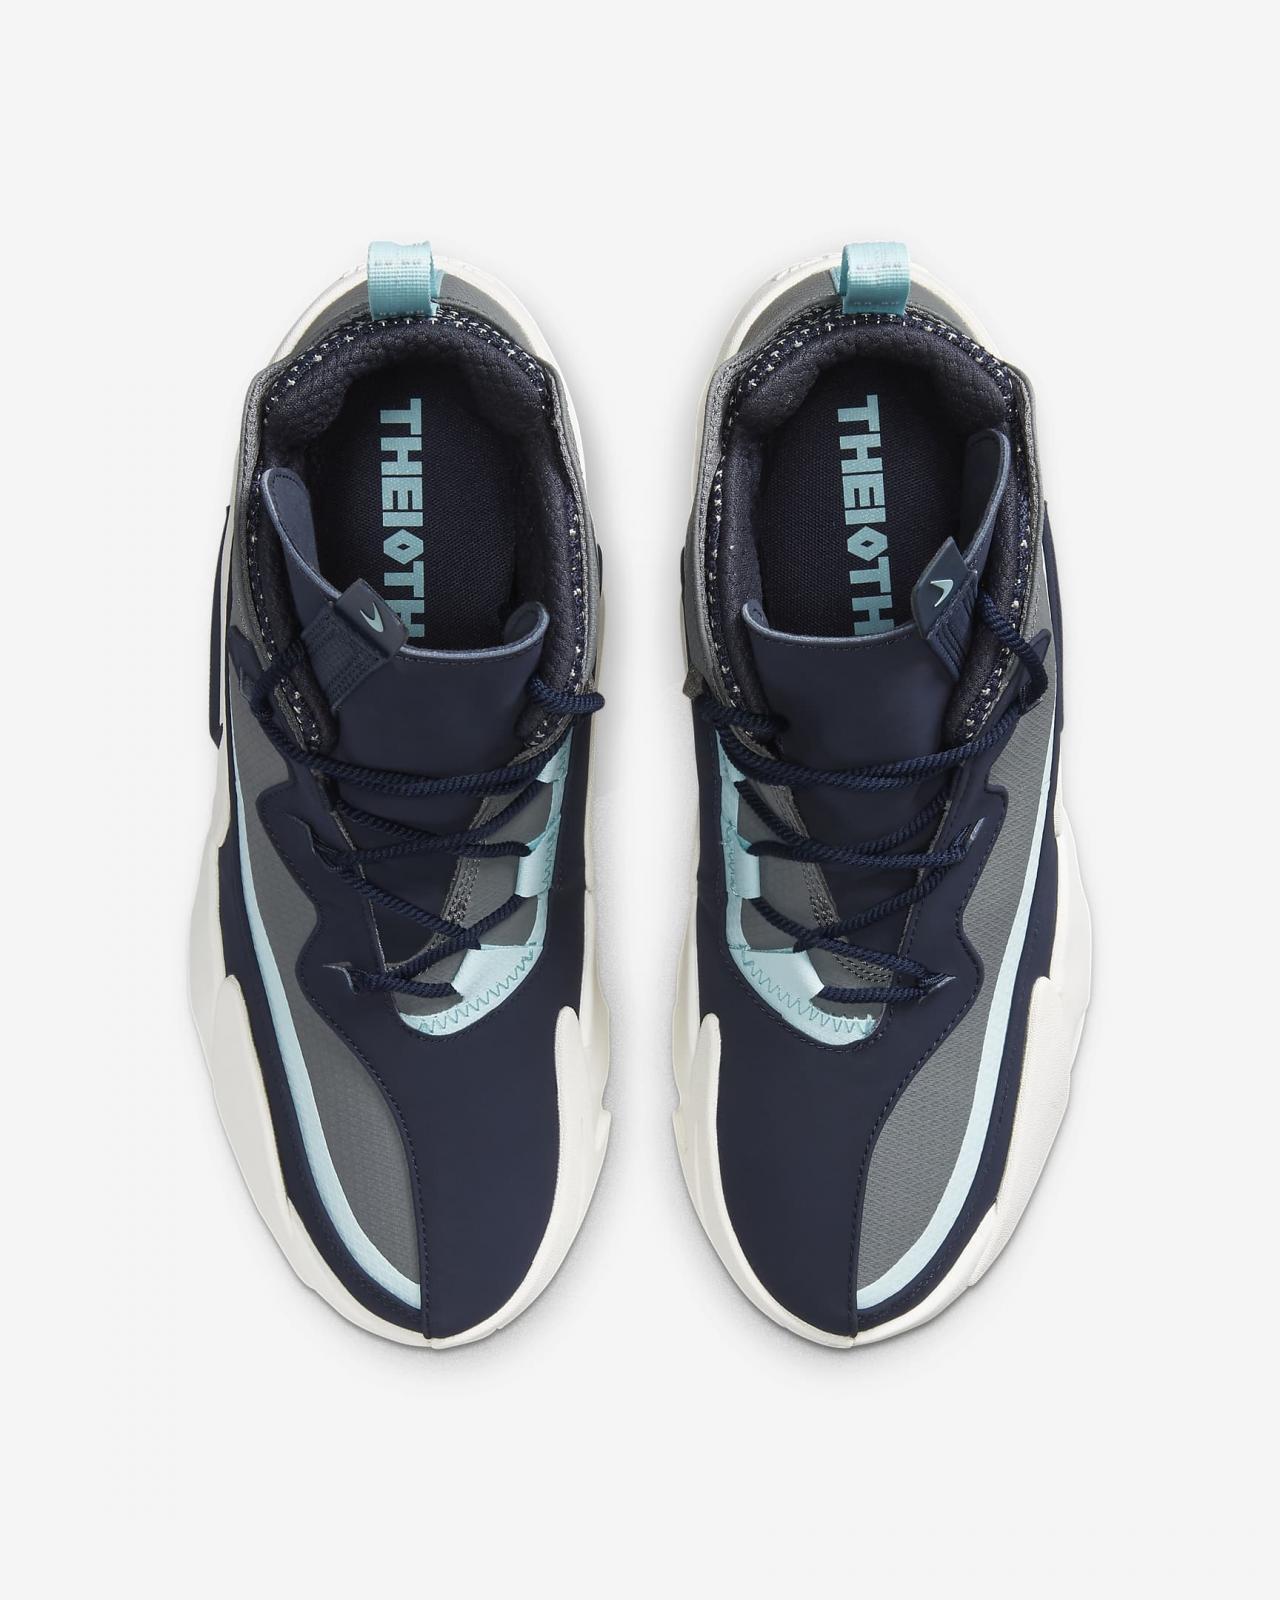 Nike Sportswear推出烟灰/黑曜石/山峰白色React Frenzy